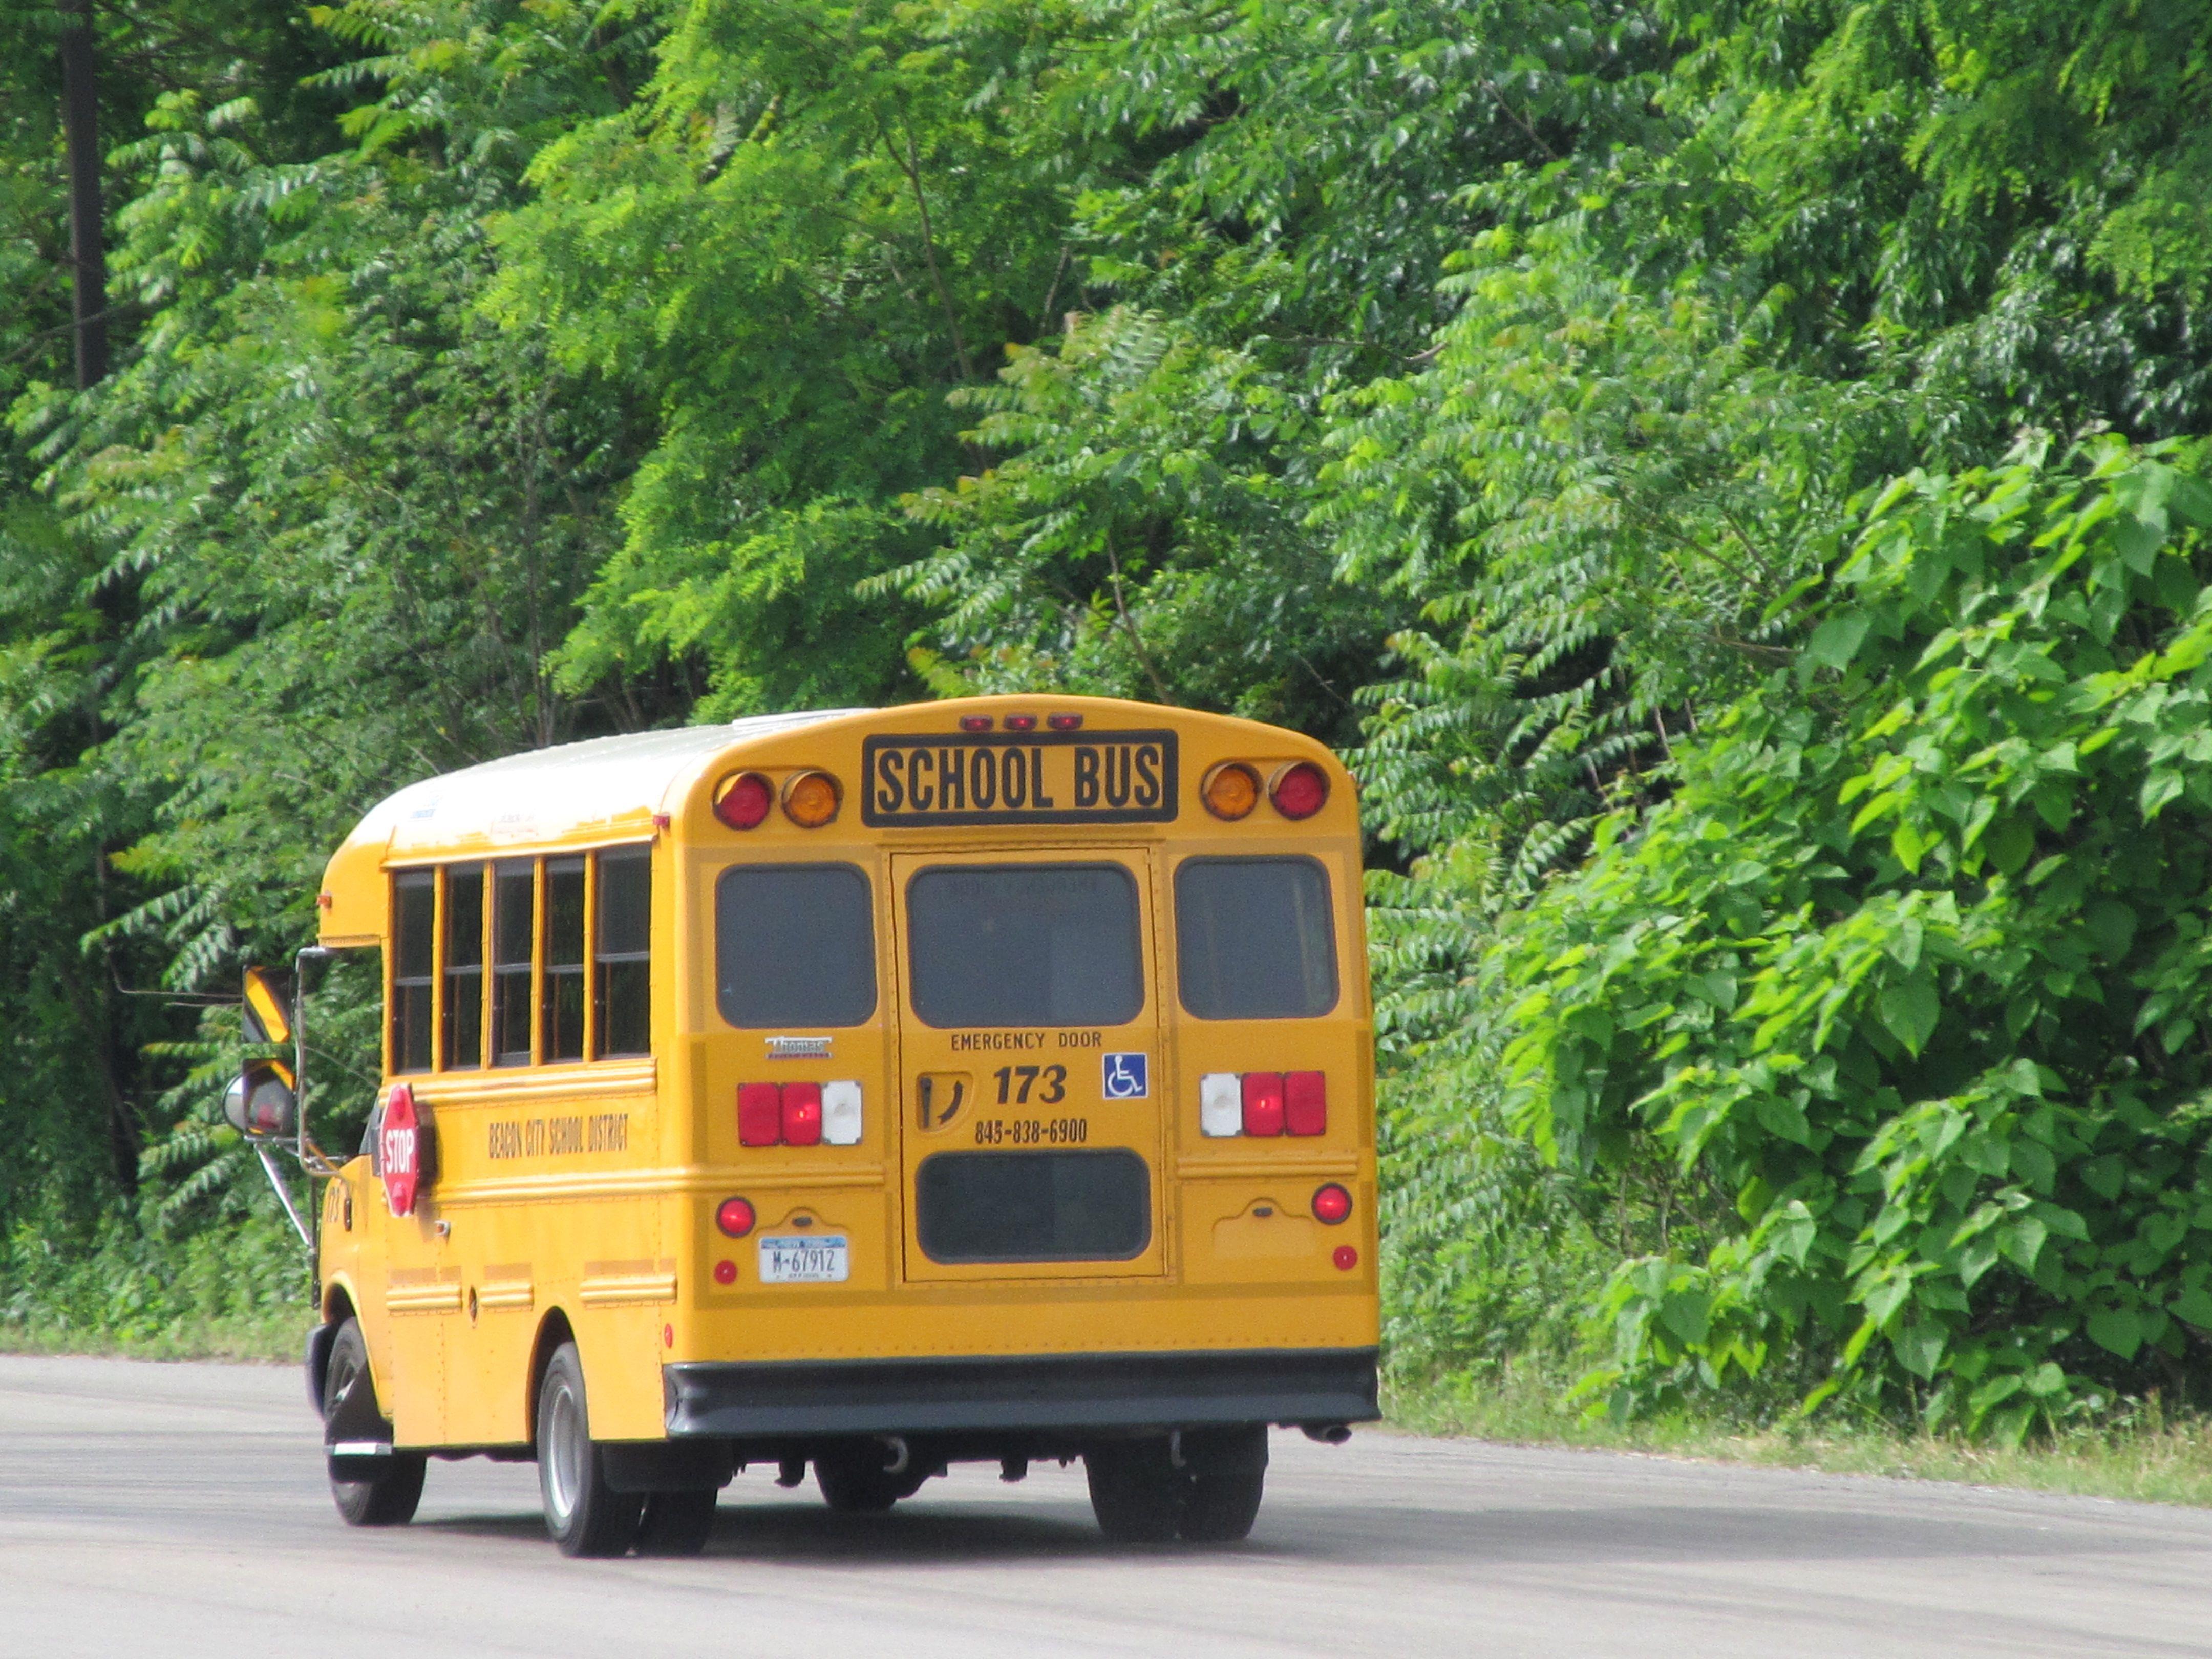 Beacon's 173 Empty road, School district, Bus